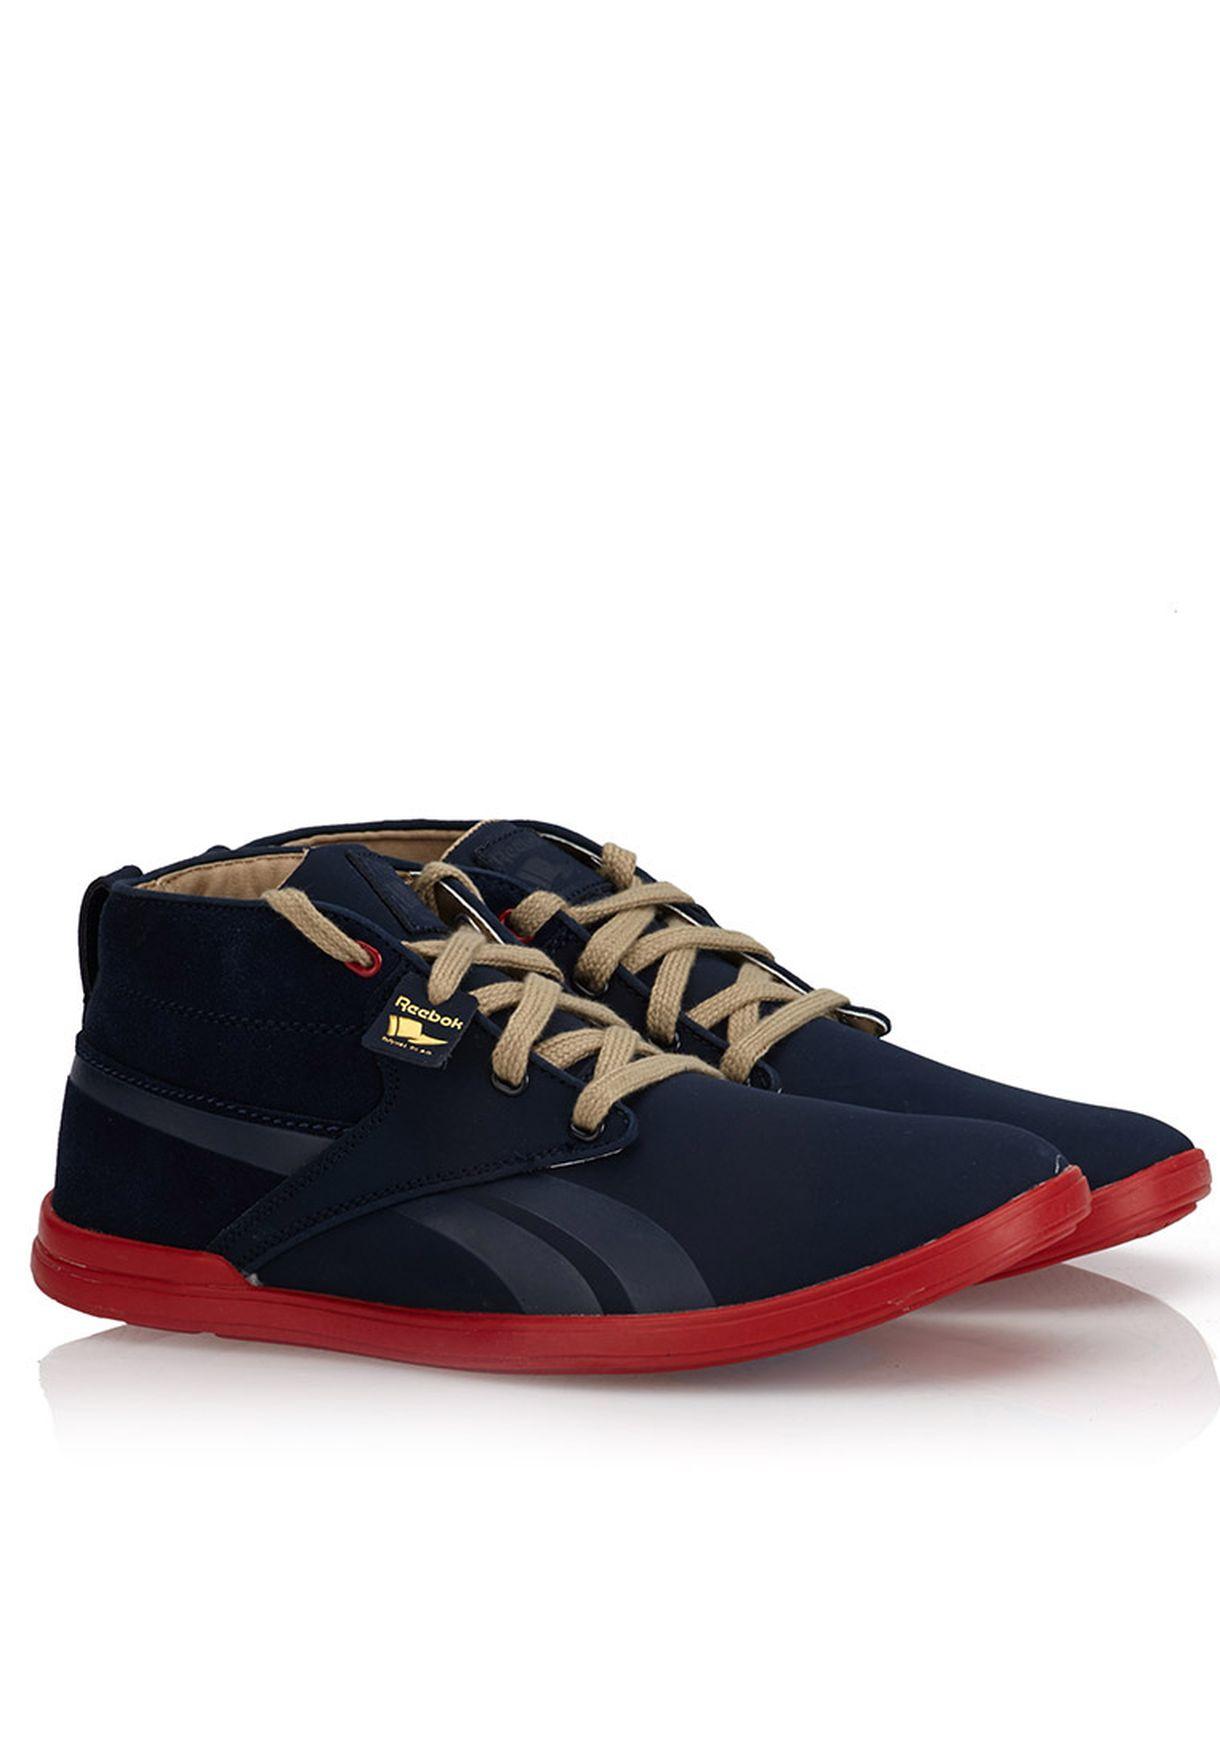 Buy Reebok navy Royal Chukka Focus for